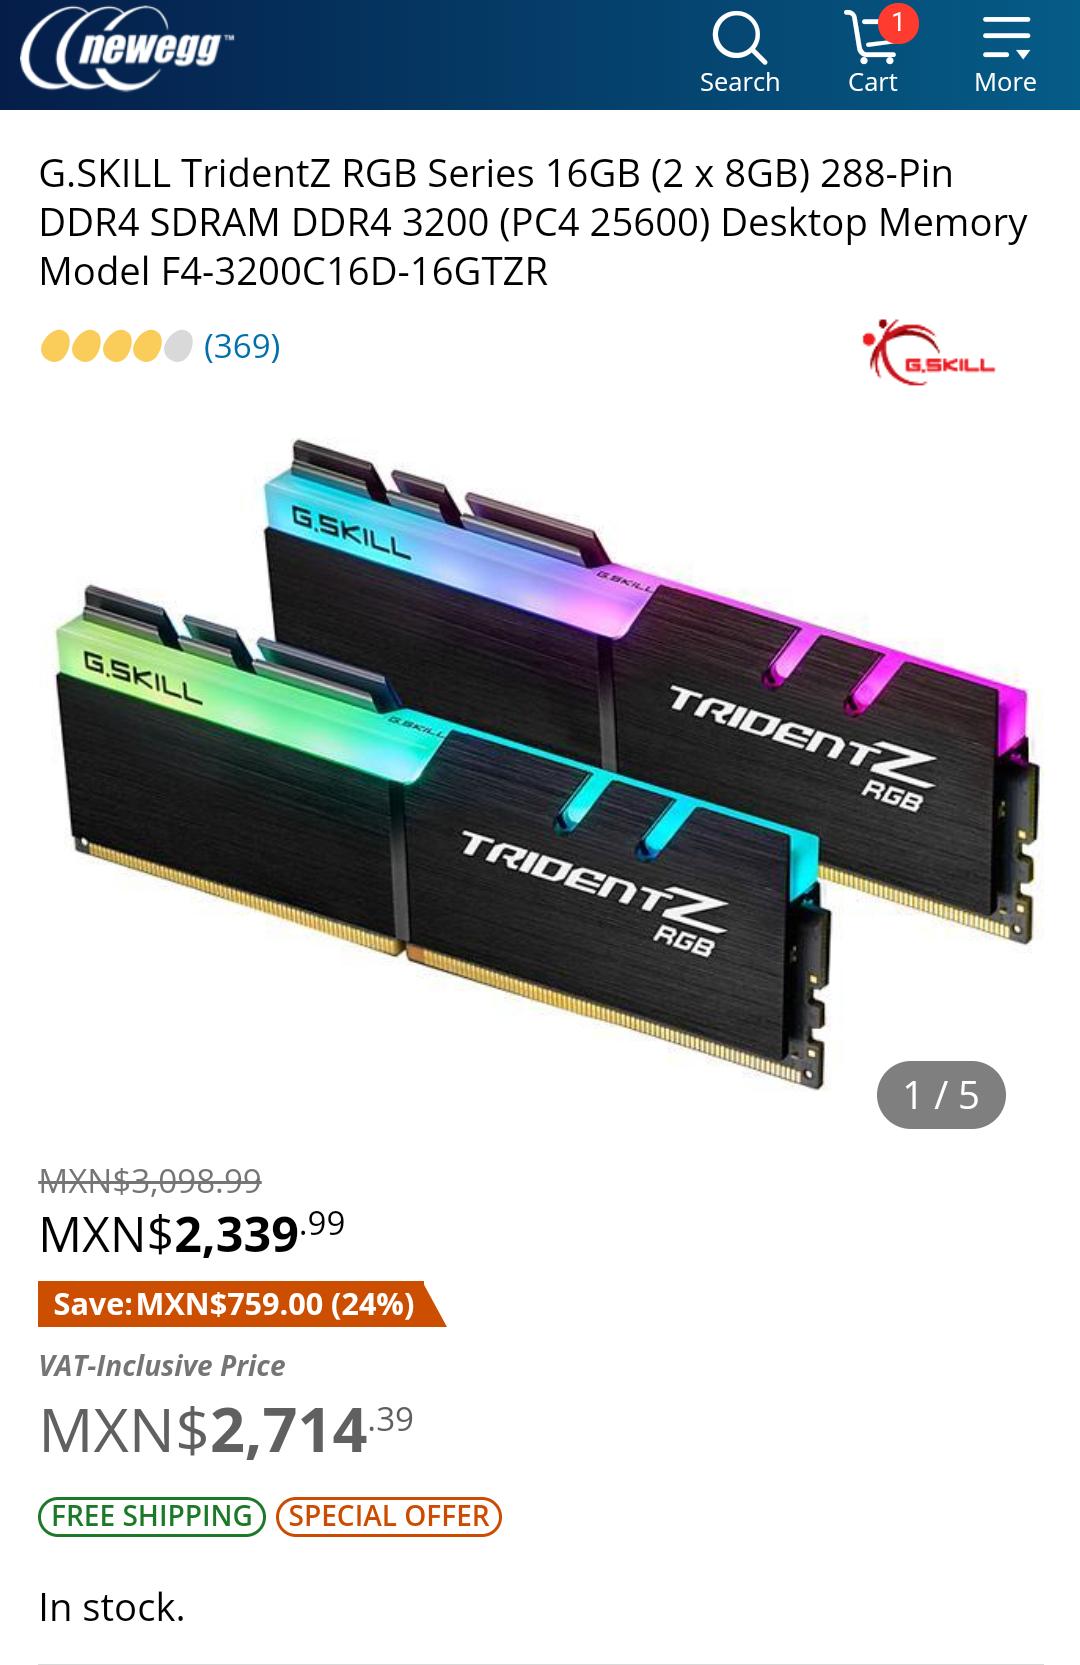 NEWEGG: G.SKILL TridentZ RGB Series 16GB (2 x 8GB) 288-Pin DDR4 SDRAM DDR4 3200 (PC4 25600)